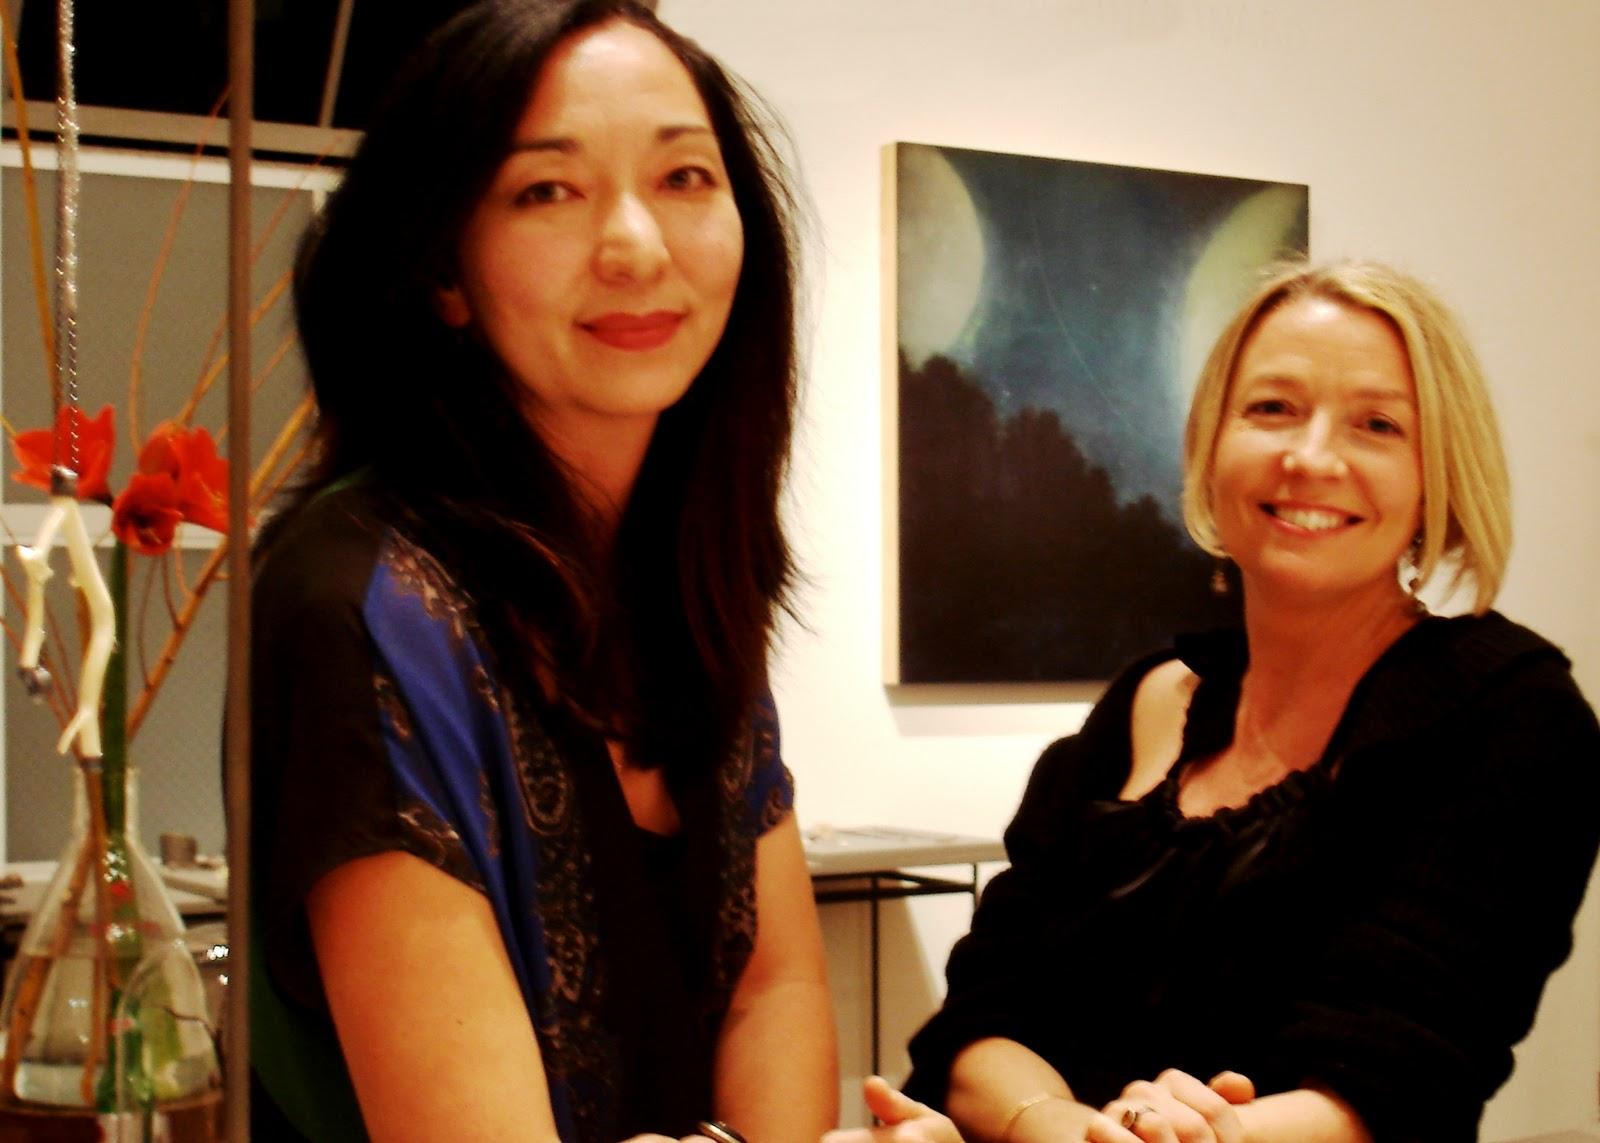 April Higashi + Aondrea Maynard, November 2011